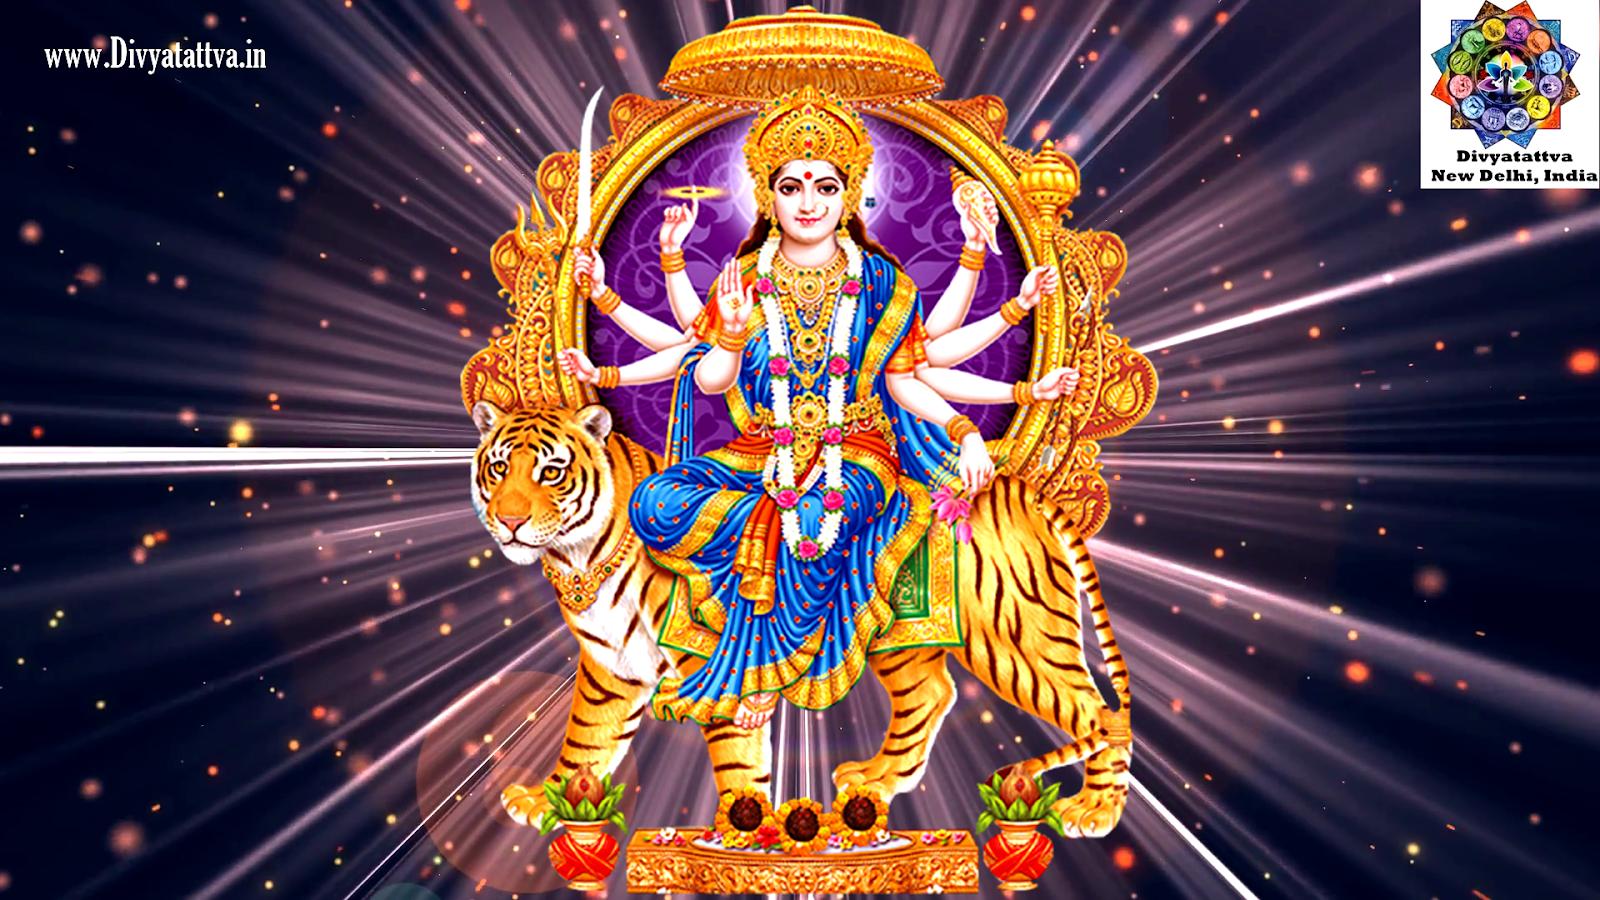 Maa Durga Hd Wallpapers Goddess Durga Images Devi Maa Durga Wallpaper Full Size Hd 631469 Hd Wallpaper Backgrounds Download